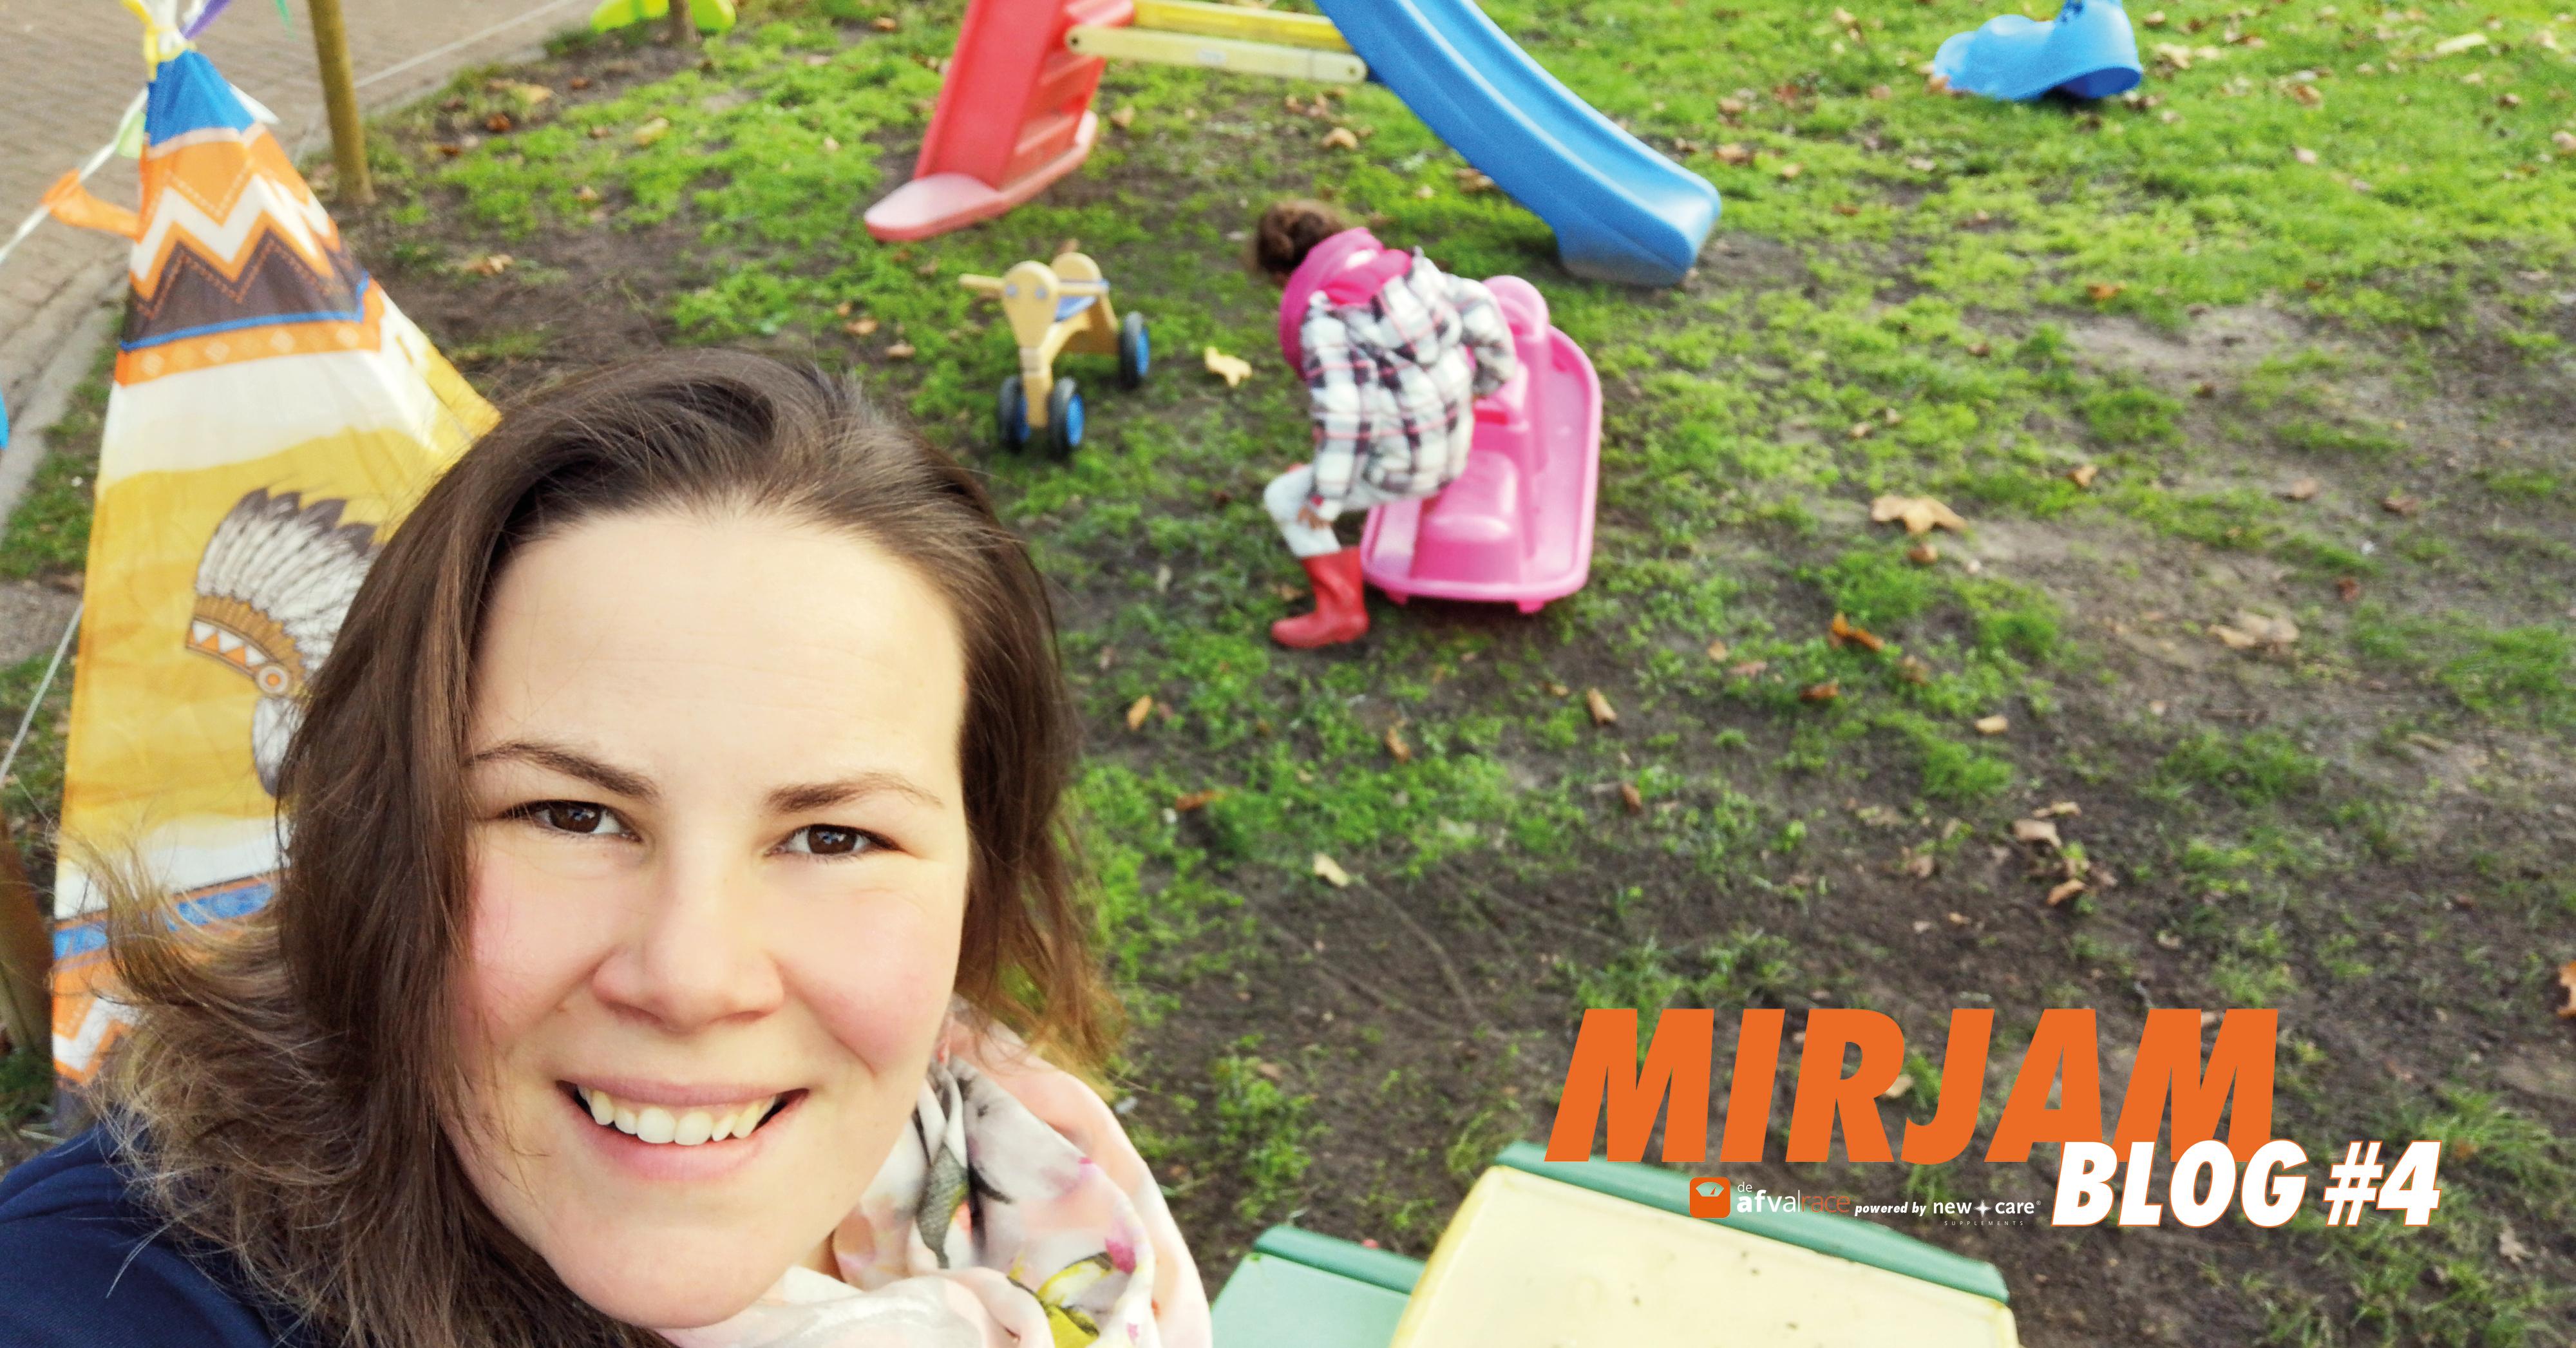 MIRJAM blog 4